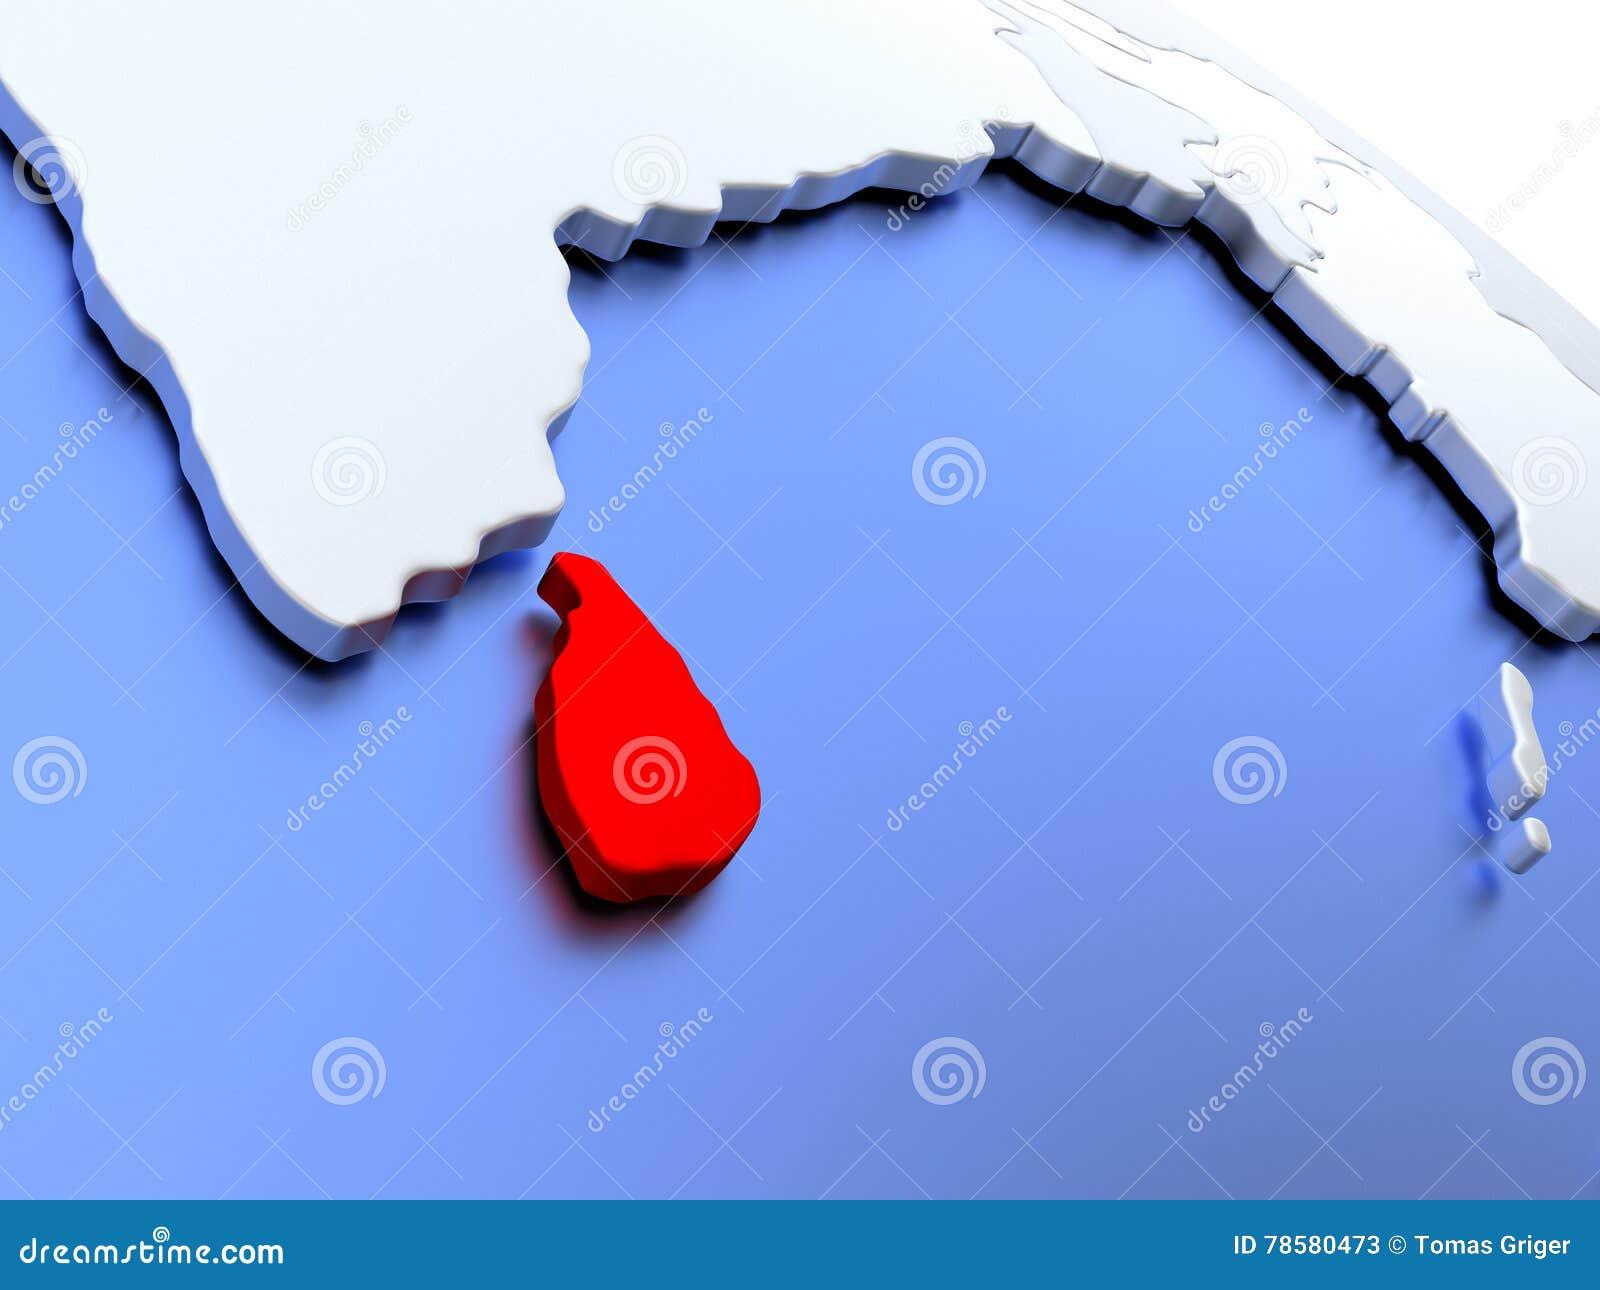 Sri Lanka on world map stock illustration. Illustration of globe ...